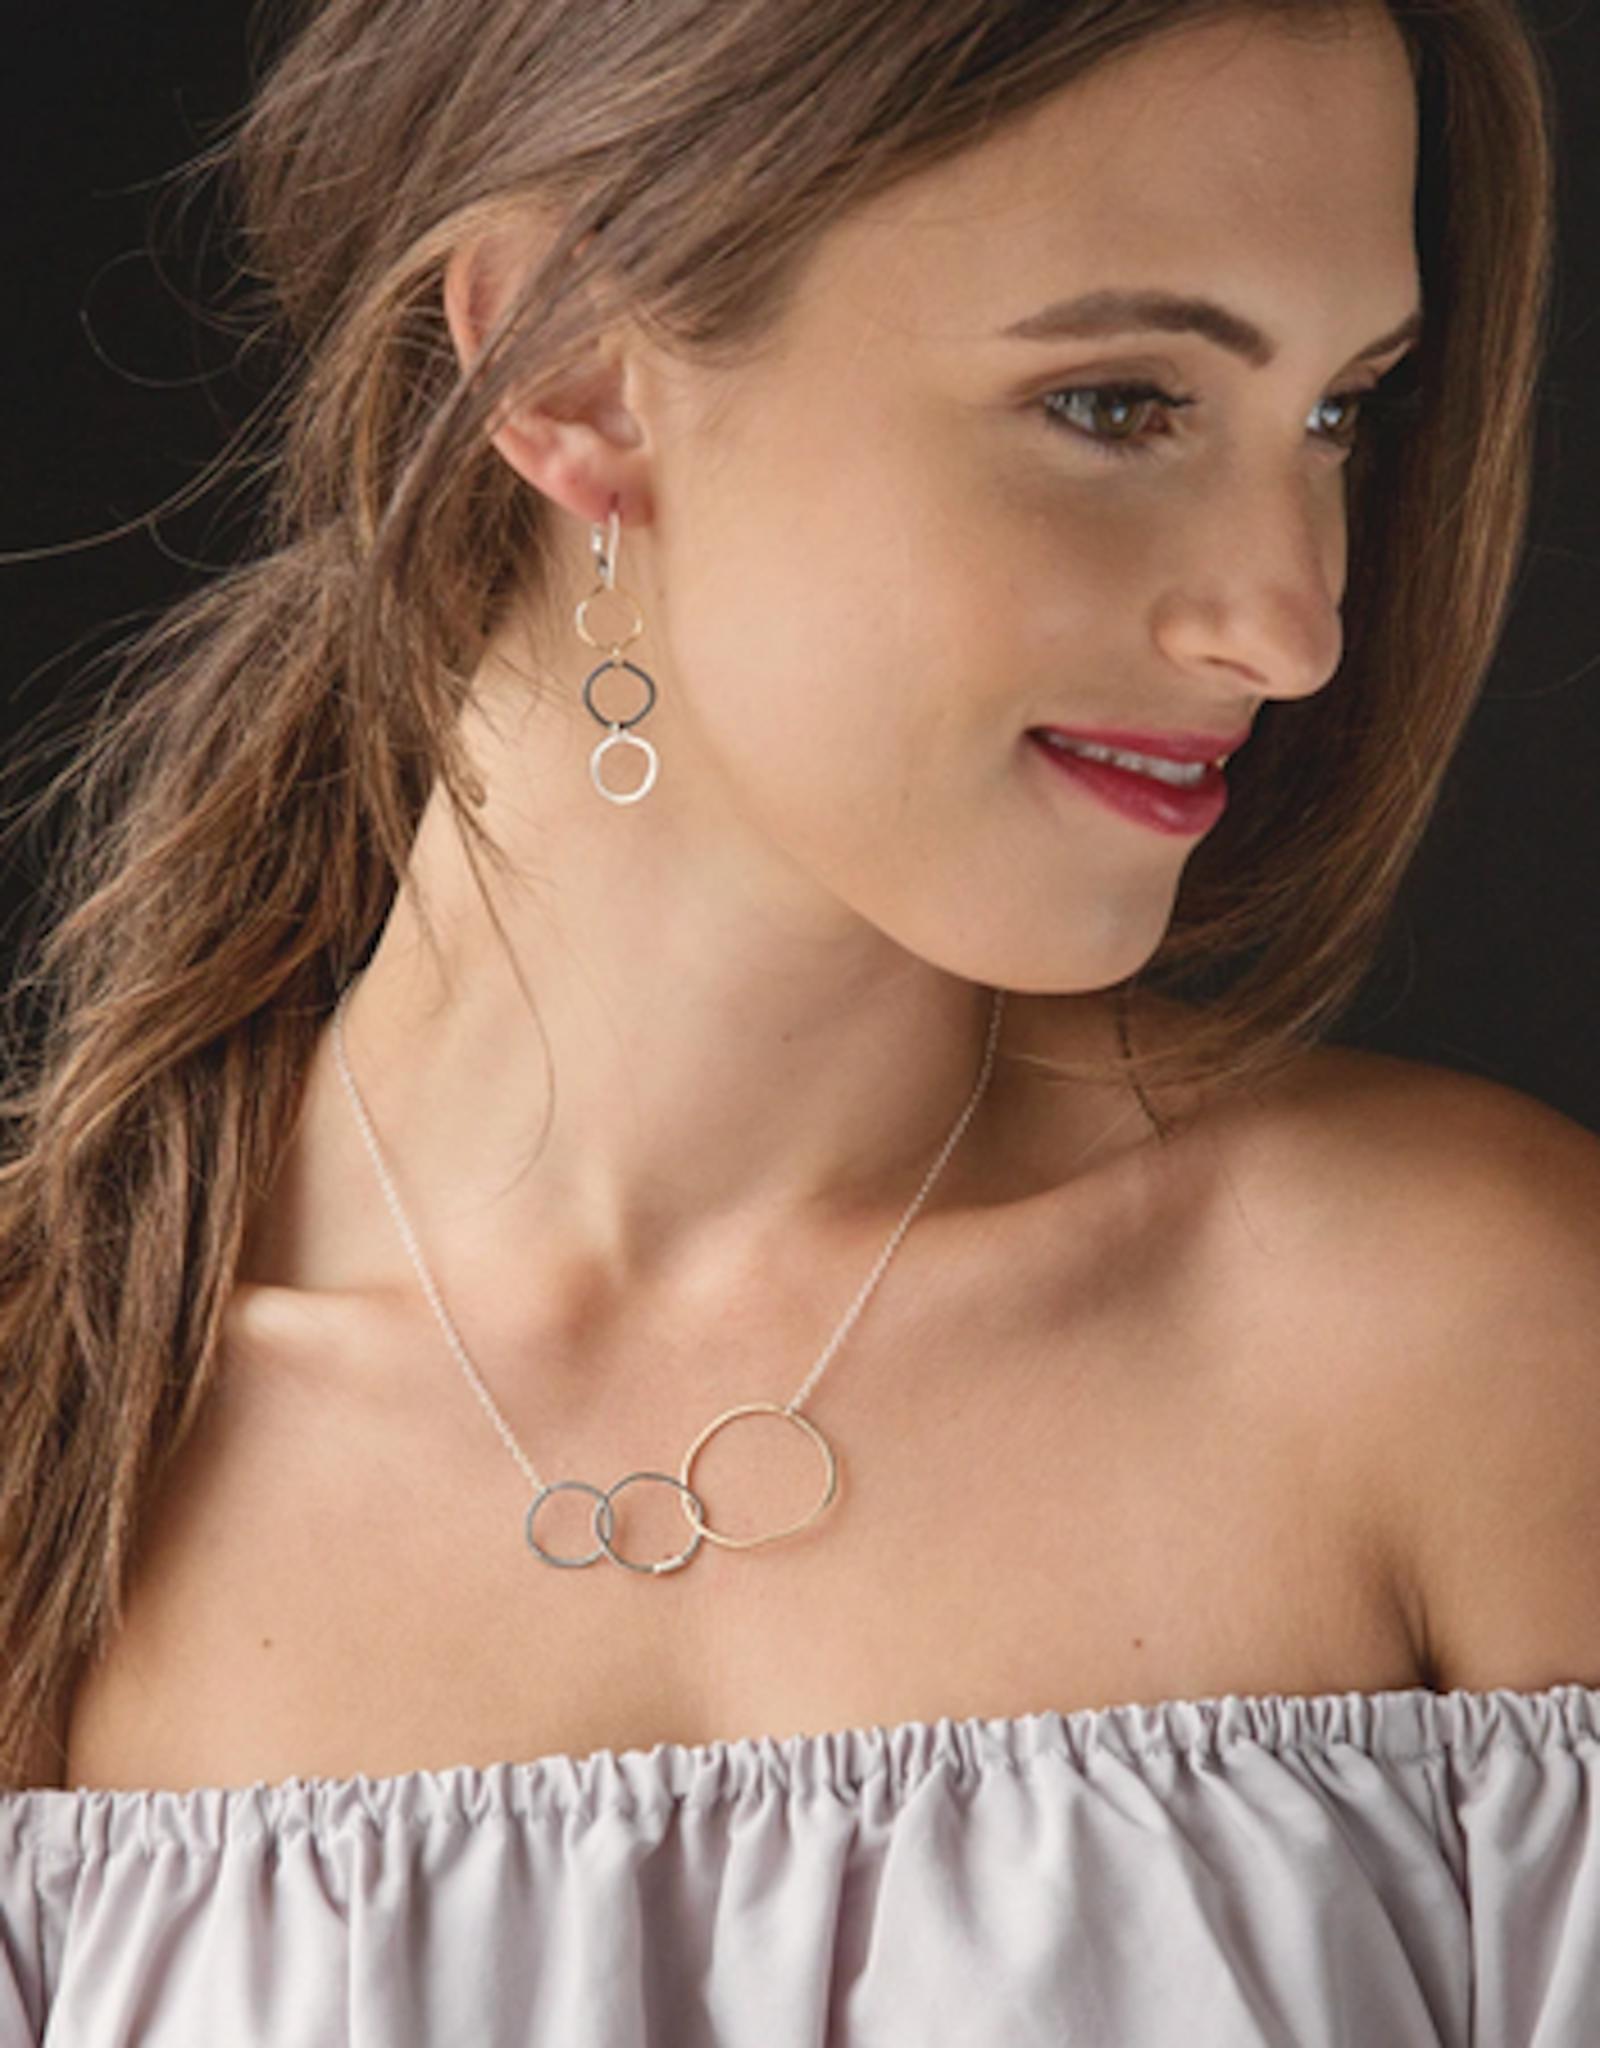 Freshie & Zero Explore Necklace